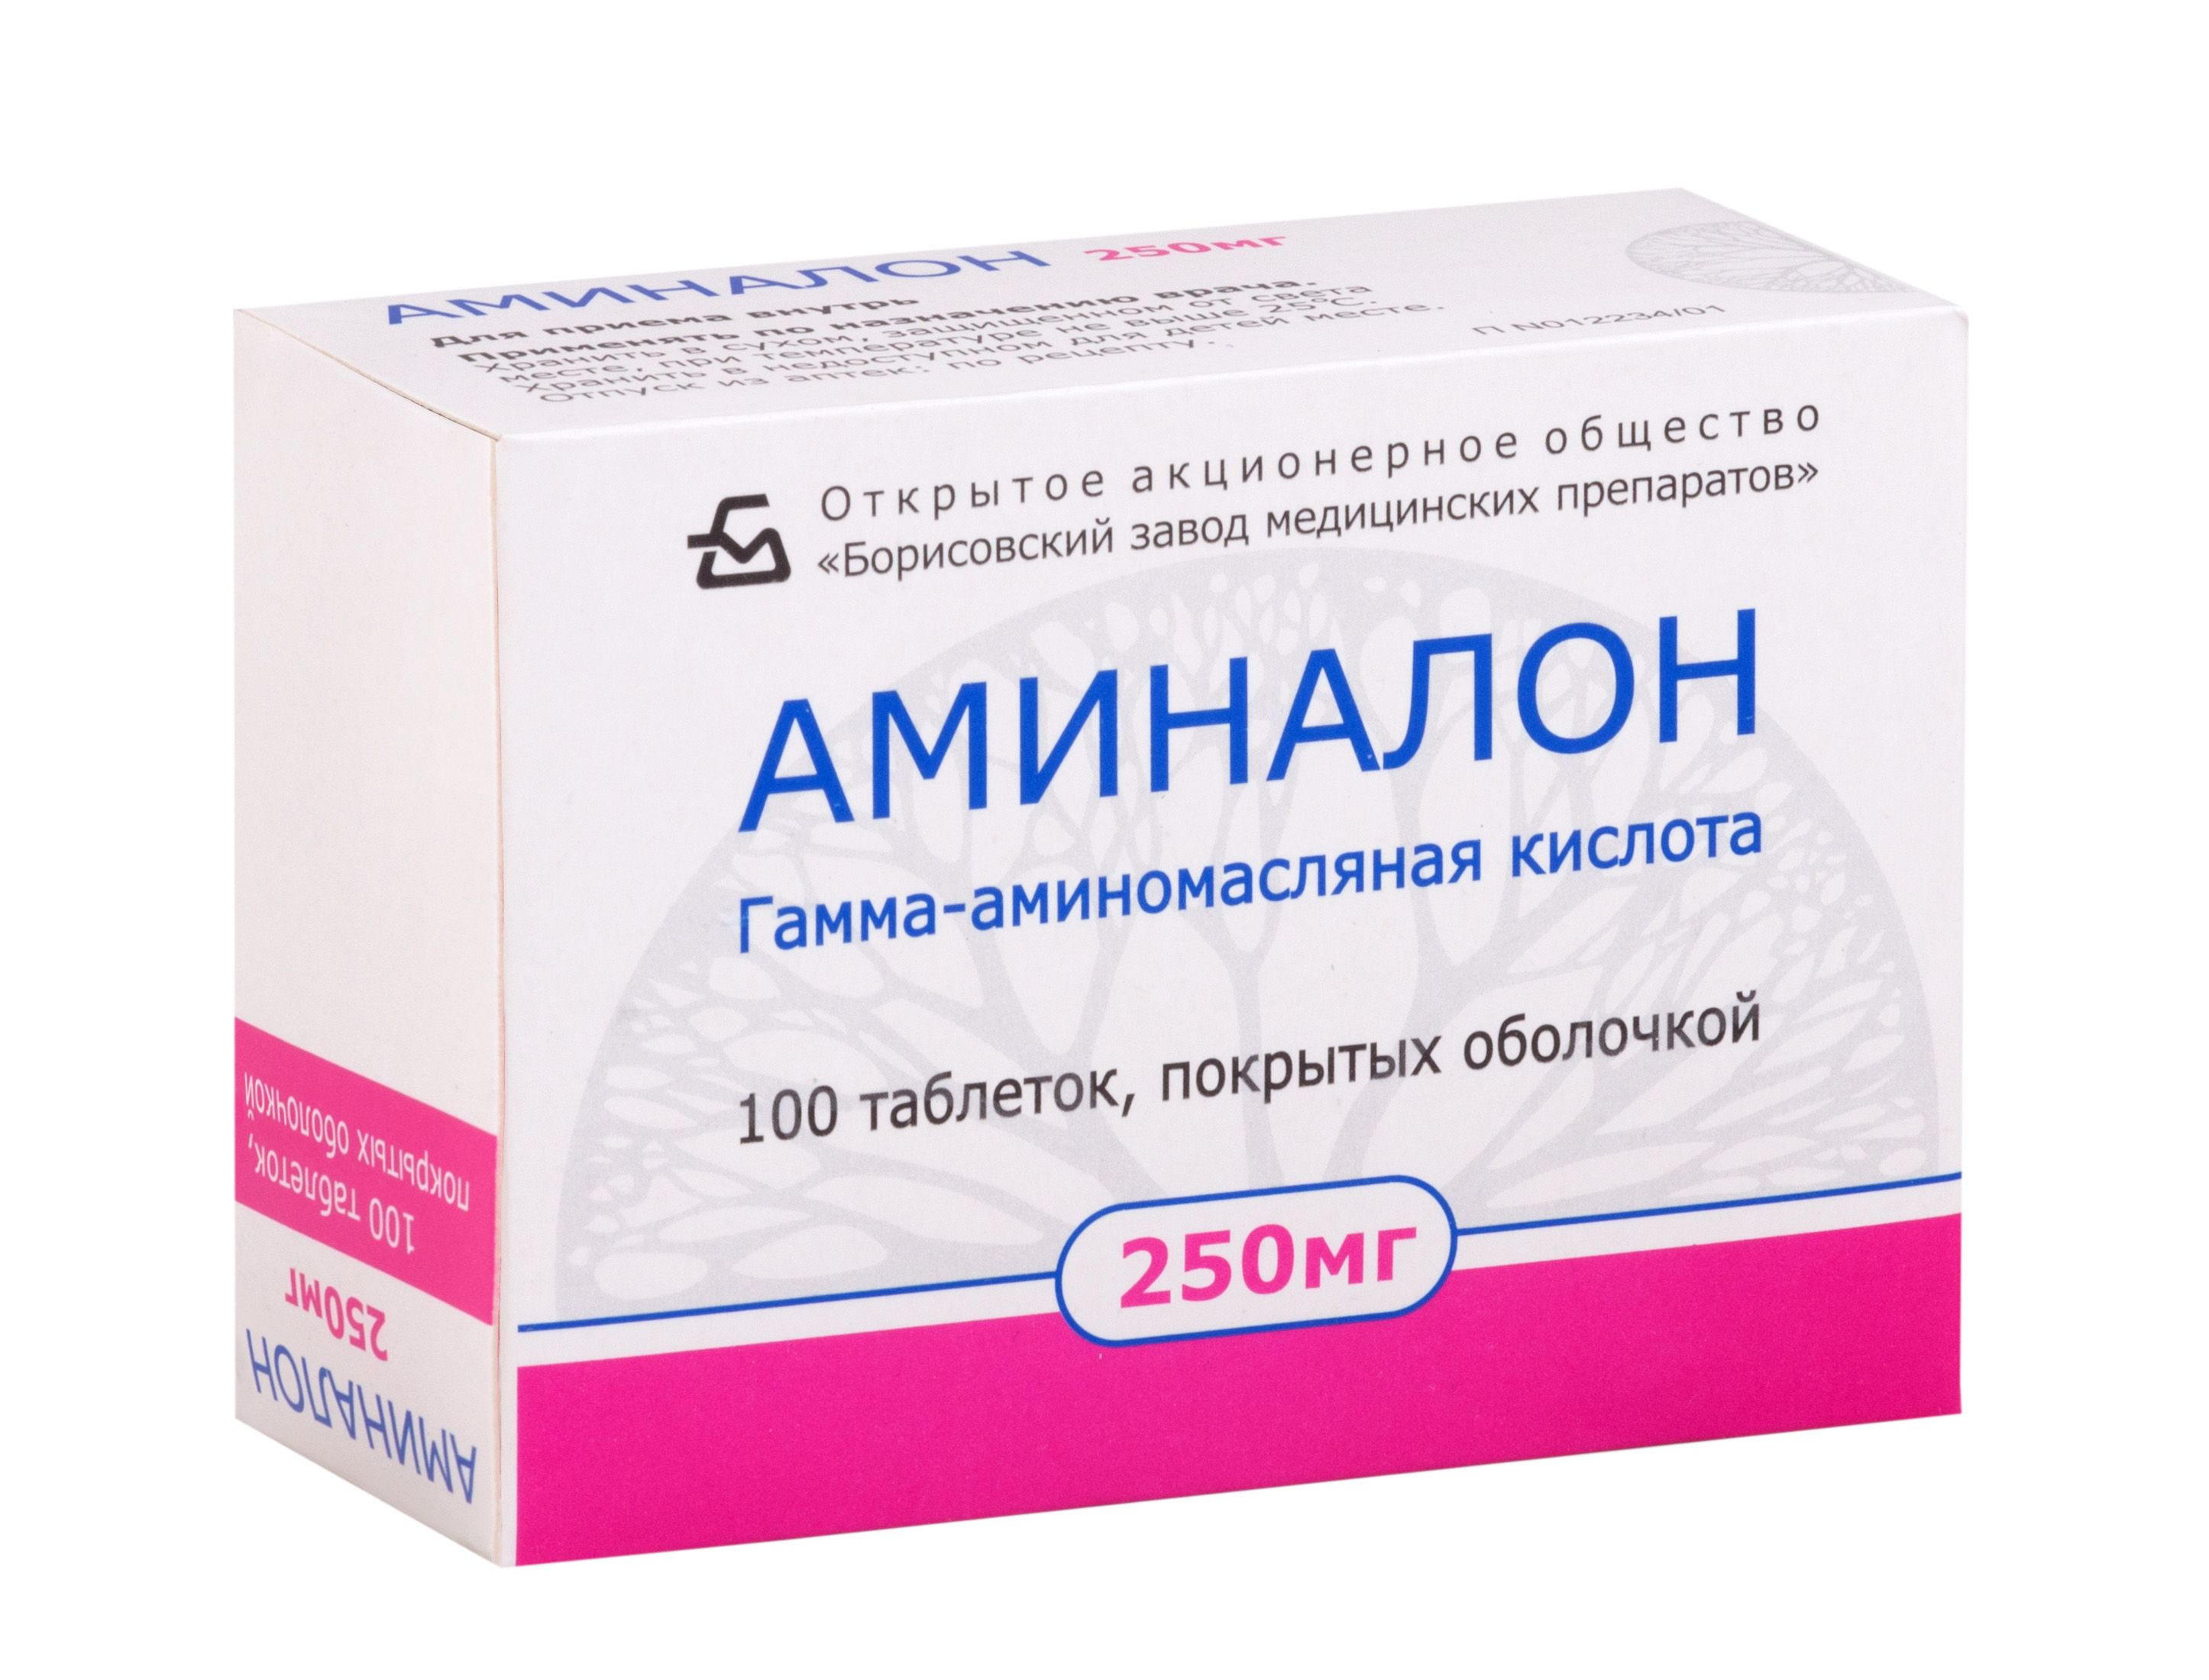 100-tabletok